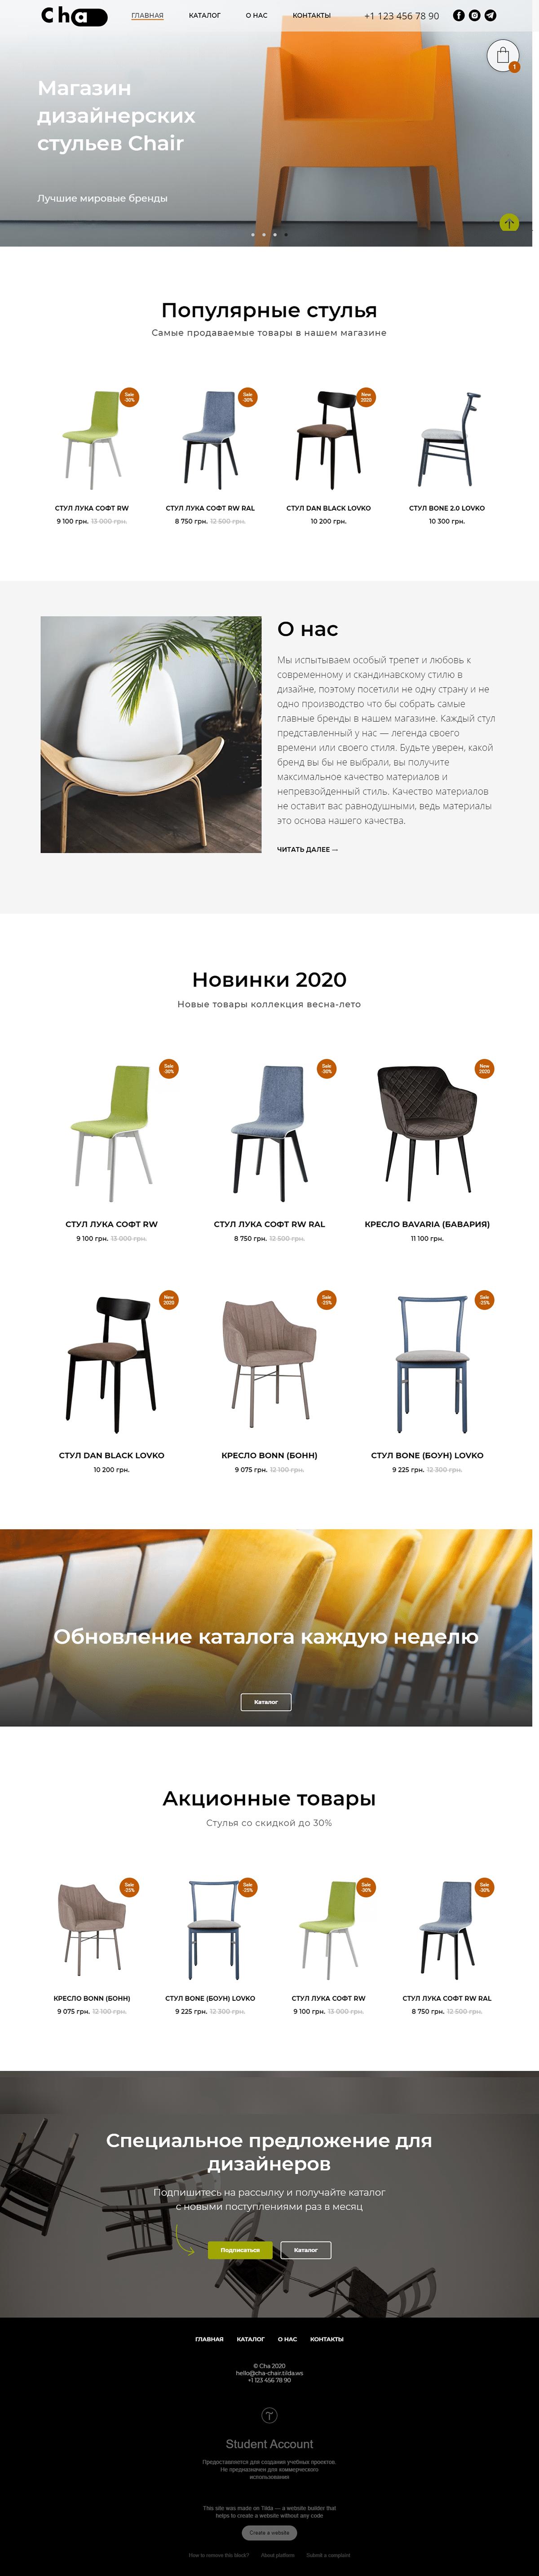 chair интернет магазин интернет-магазин стульев стулья Тильда